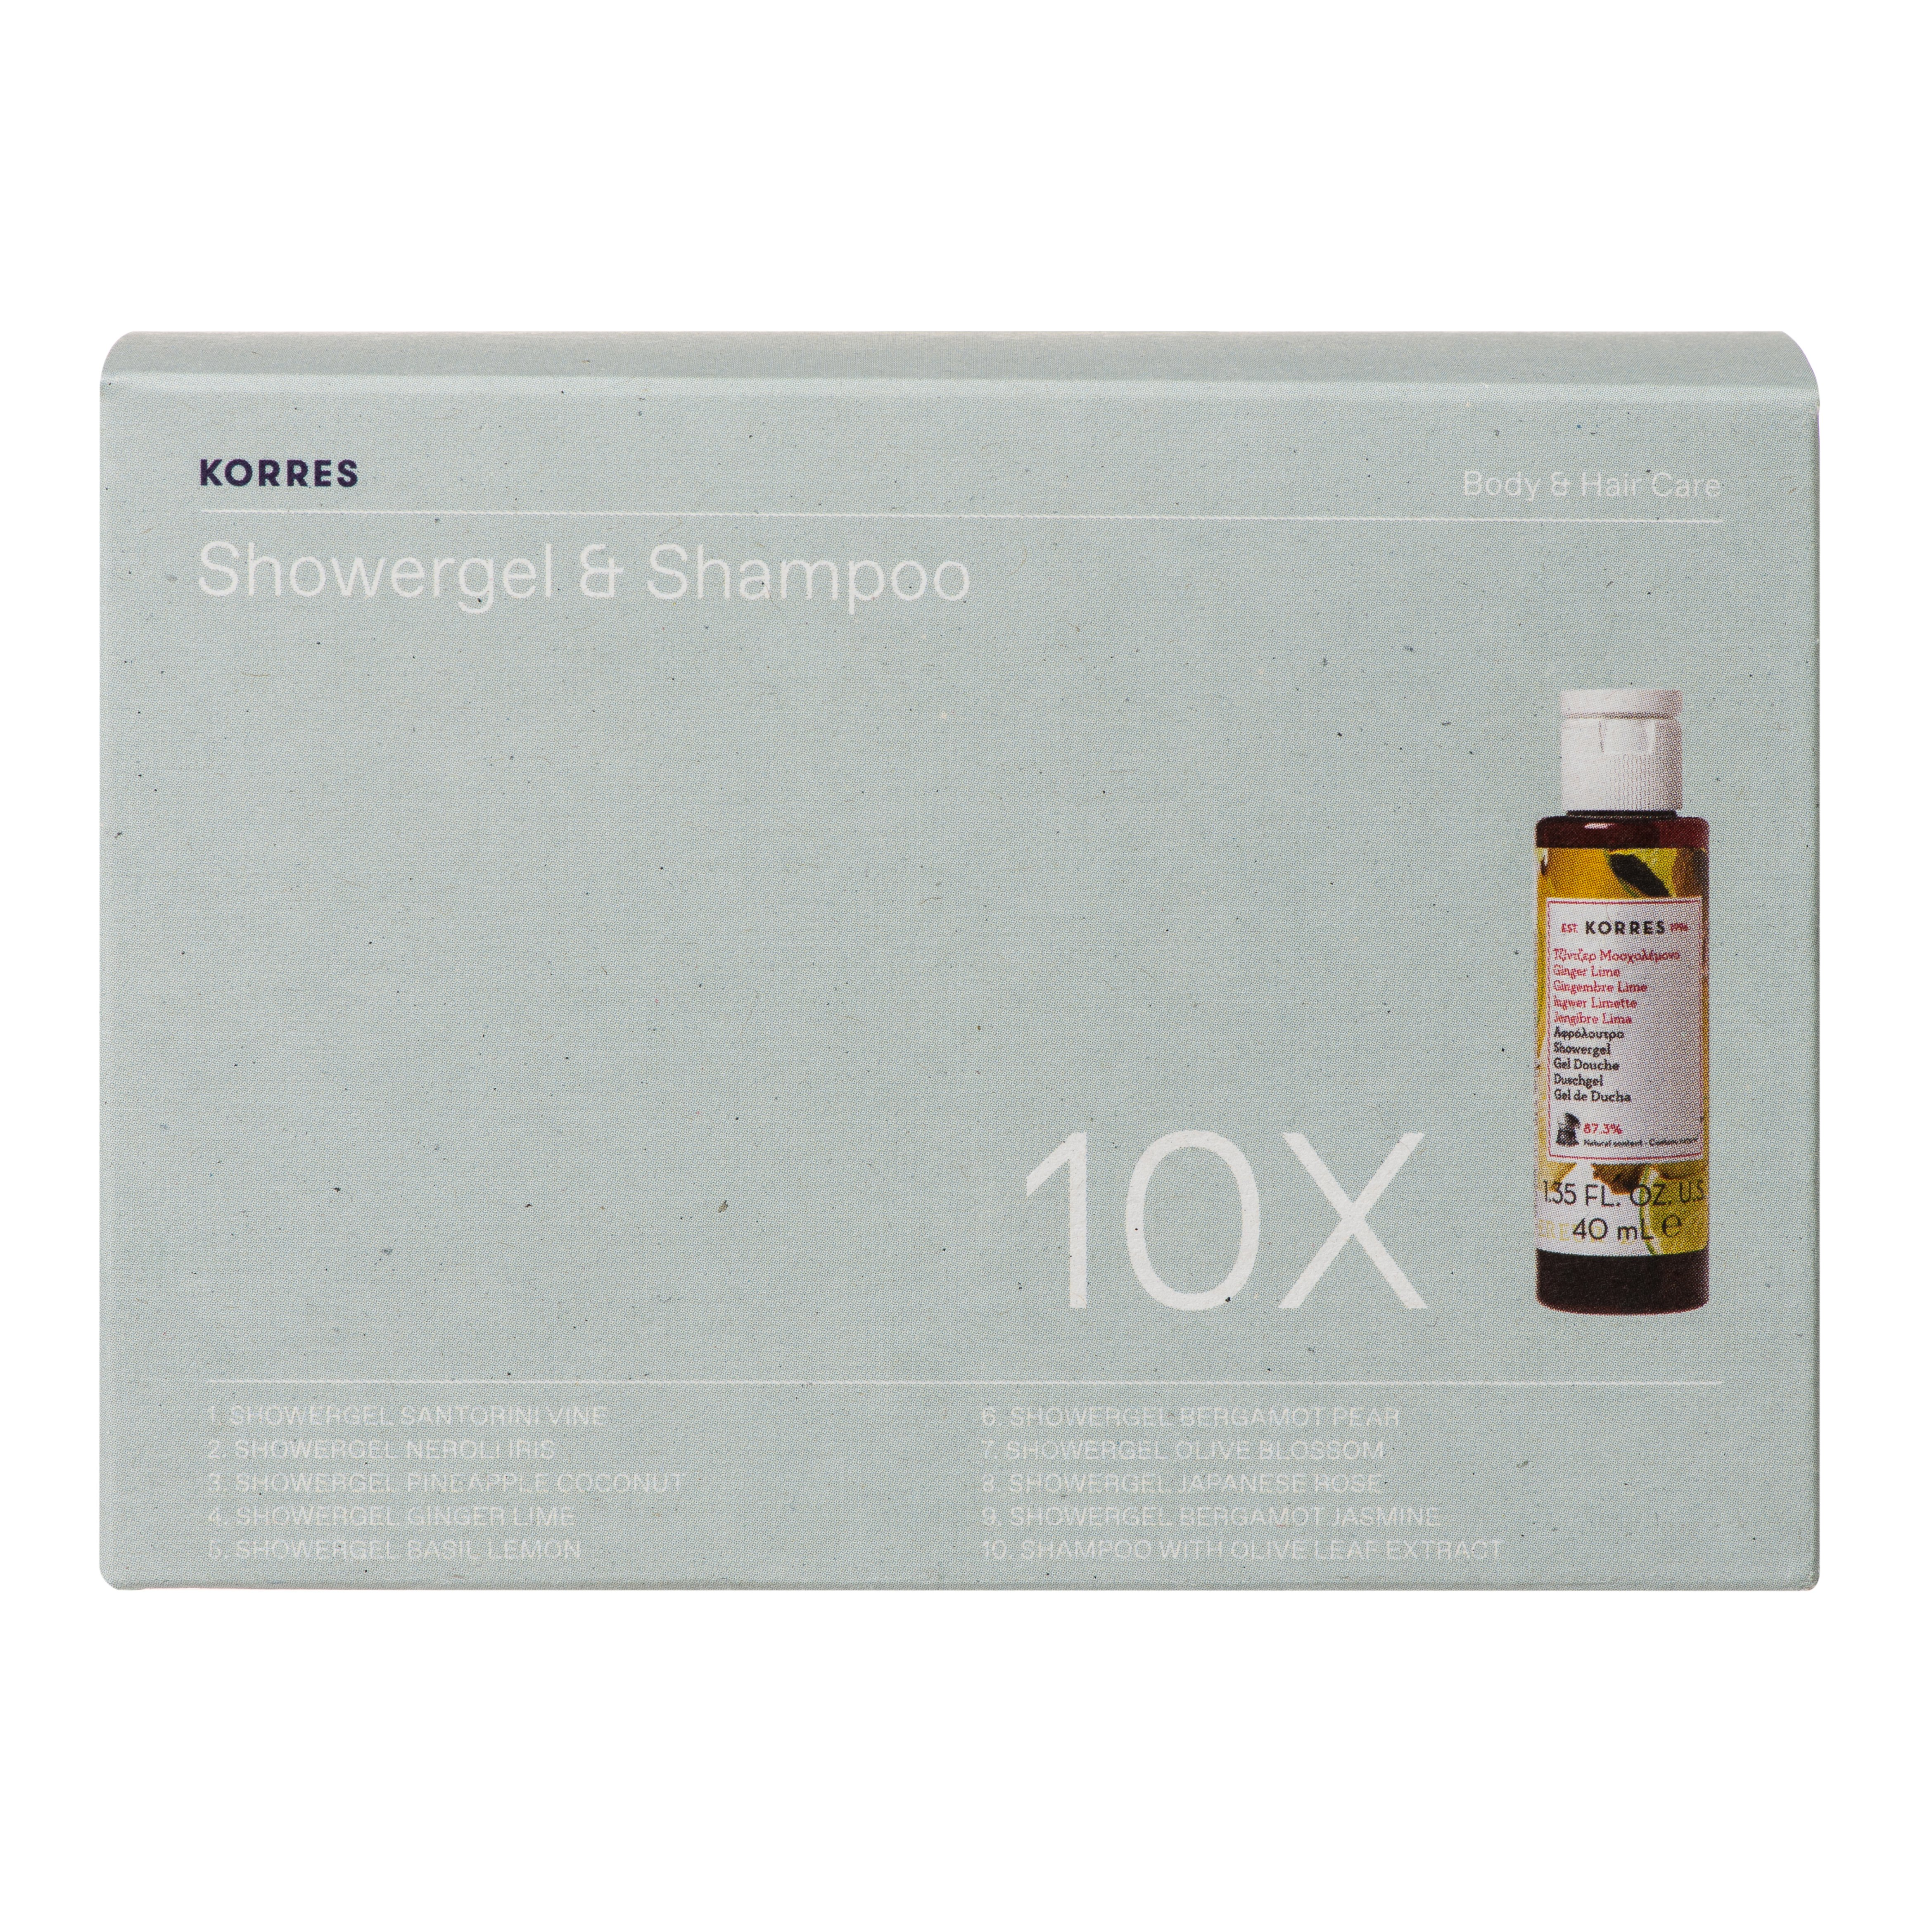 Korres Πακέτο Προσφοράς The Best-Of Showergels Collection Αρωματικά Αφρόλουτρα Travel Size 10x40ml σε Ειδική Τιμή